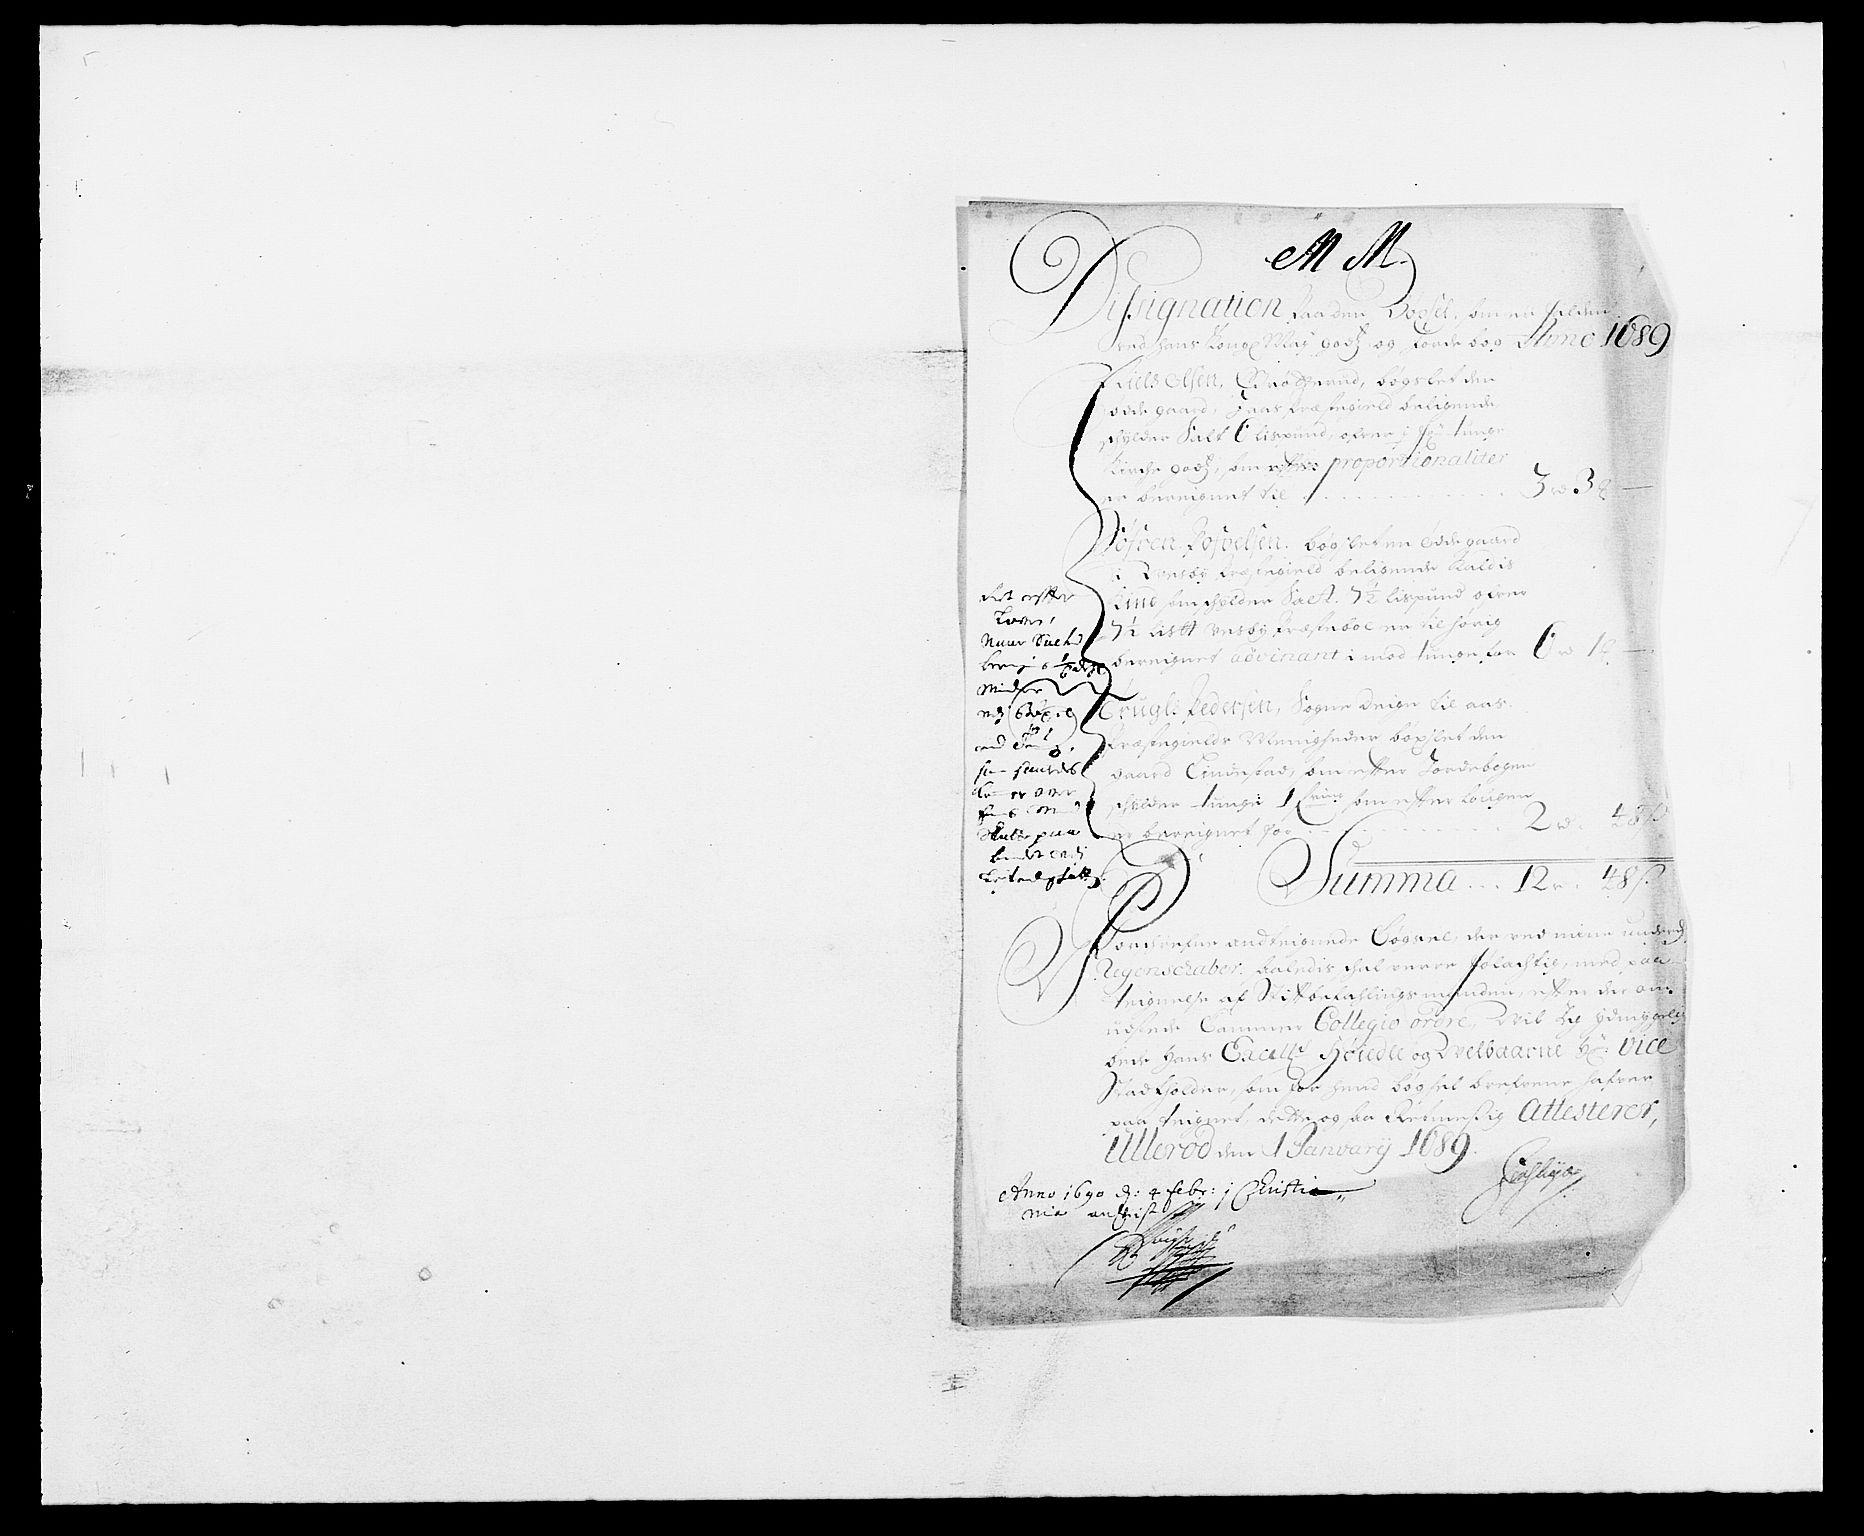 RA, Rentekammeret inntil 1814, Reviderte regnskaper, Fogderegnskap, R09/L0435: Fogderegnskap Follo, 1689-1691, s. 23